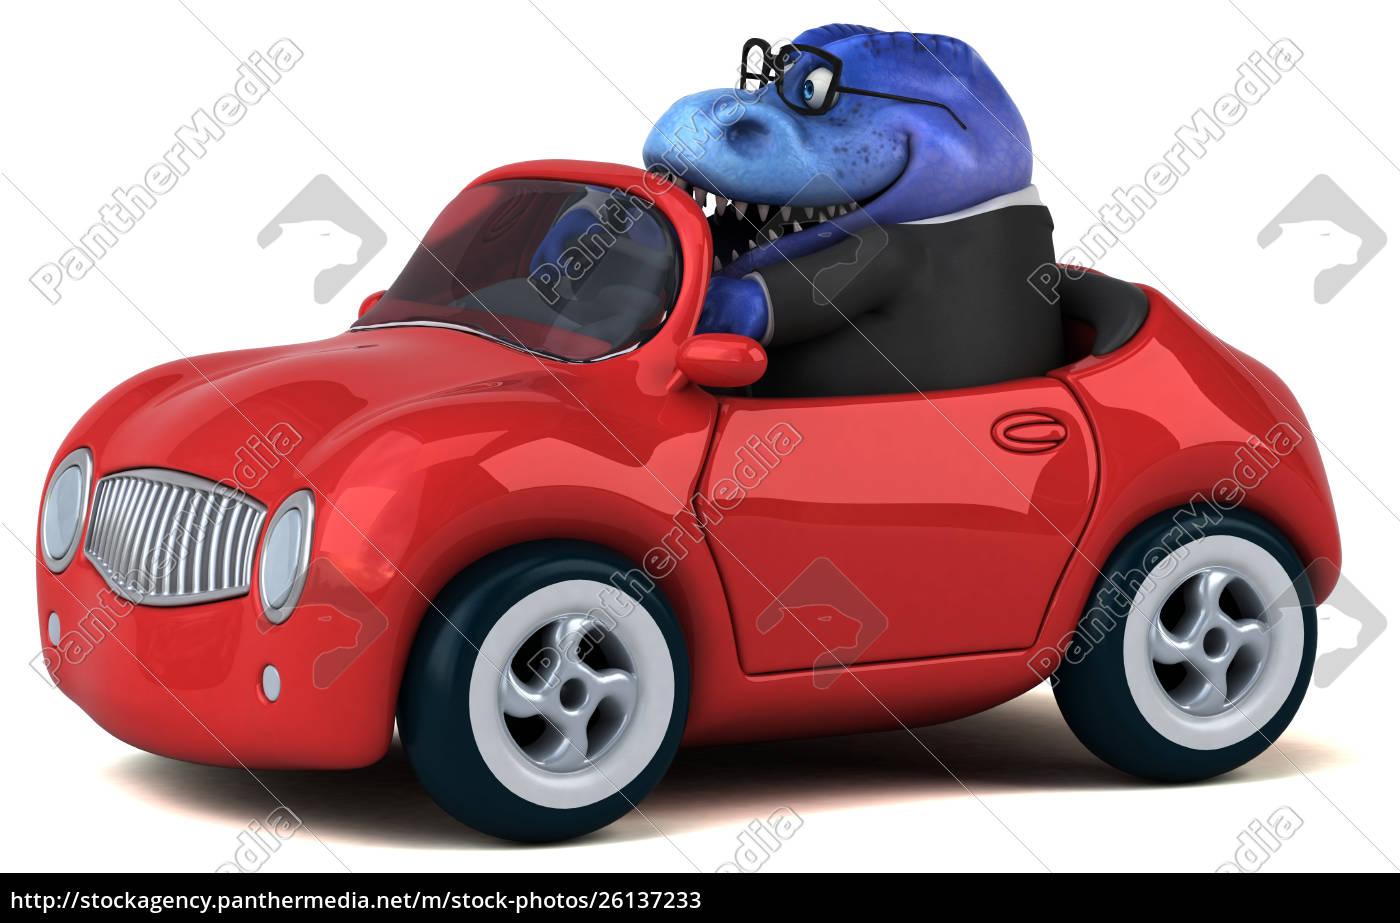 zabawna, żaba, -, ilustracja, 3d - 26137233